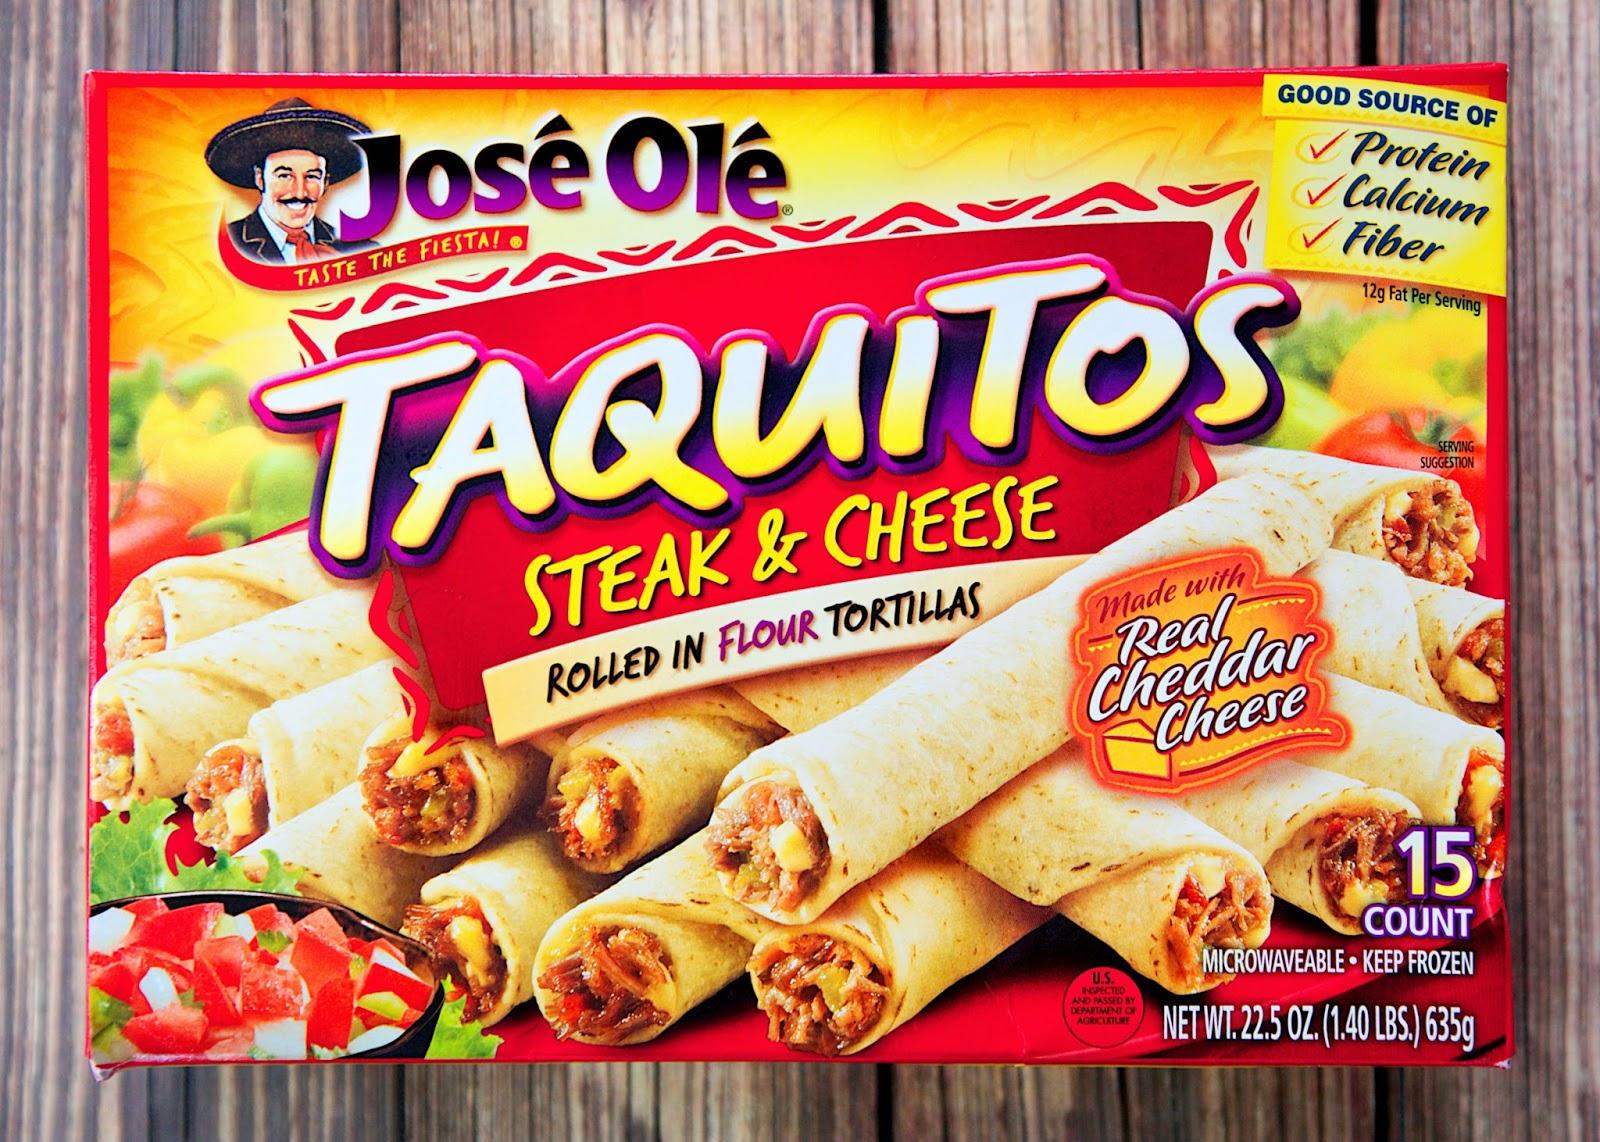 Taquito-lada Casserole Recipe - use frozen Jose Ole taquitos for a quick Mexican taquito enchilada casserole. Top with lettuce, tomatoes, olives, green onions and sour cream.